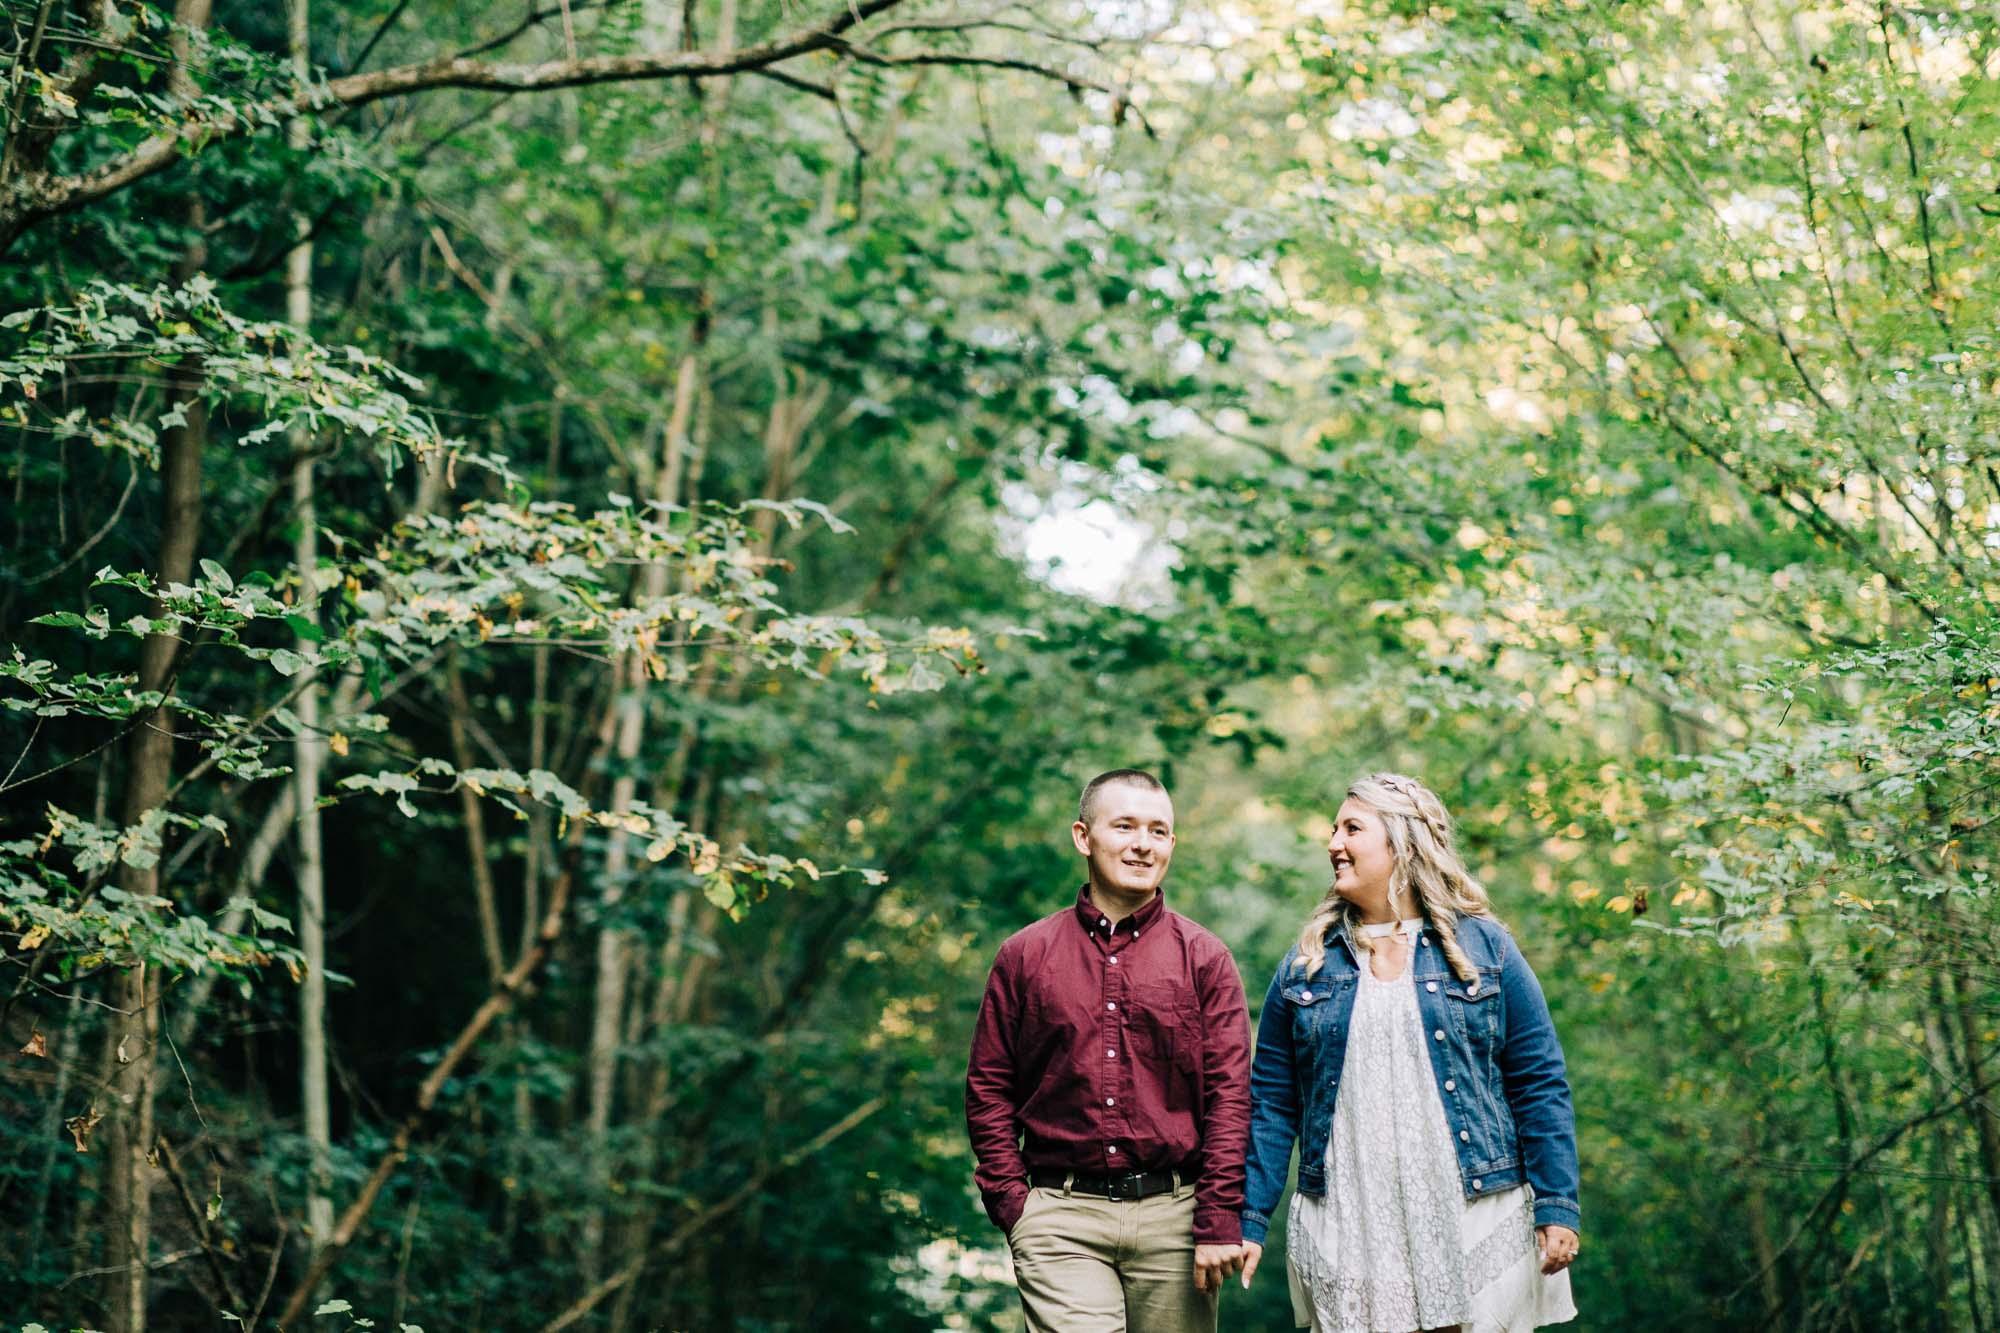 nicole-dumond-photography-engagement-7122.jpg